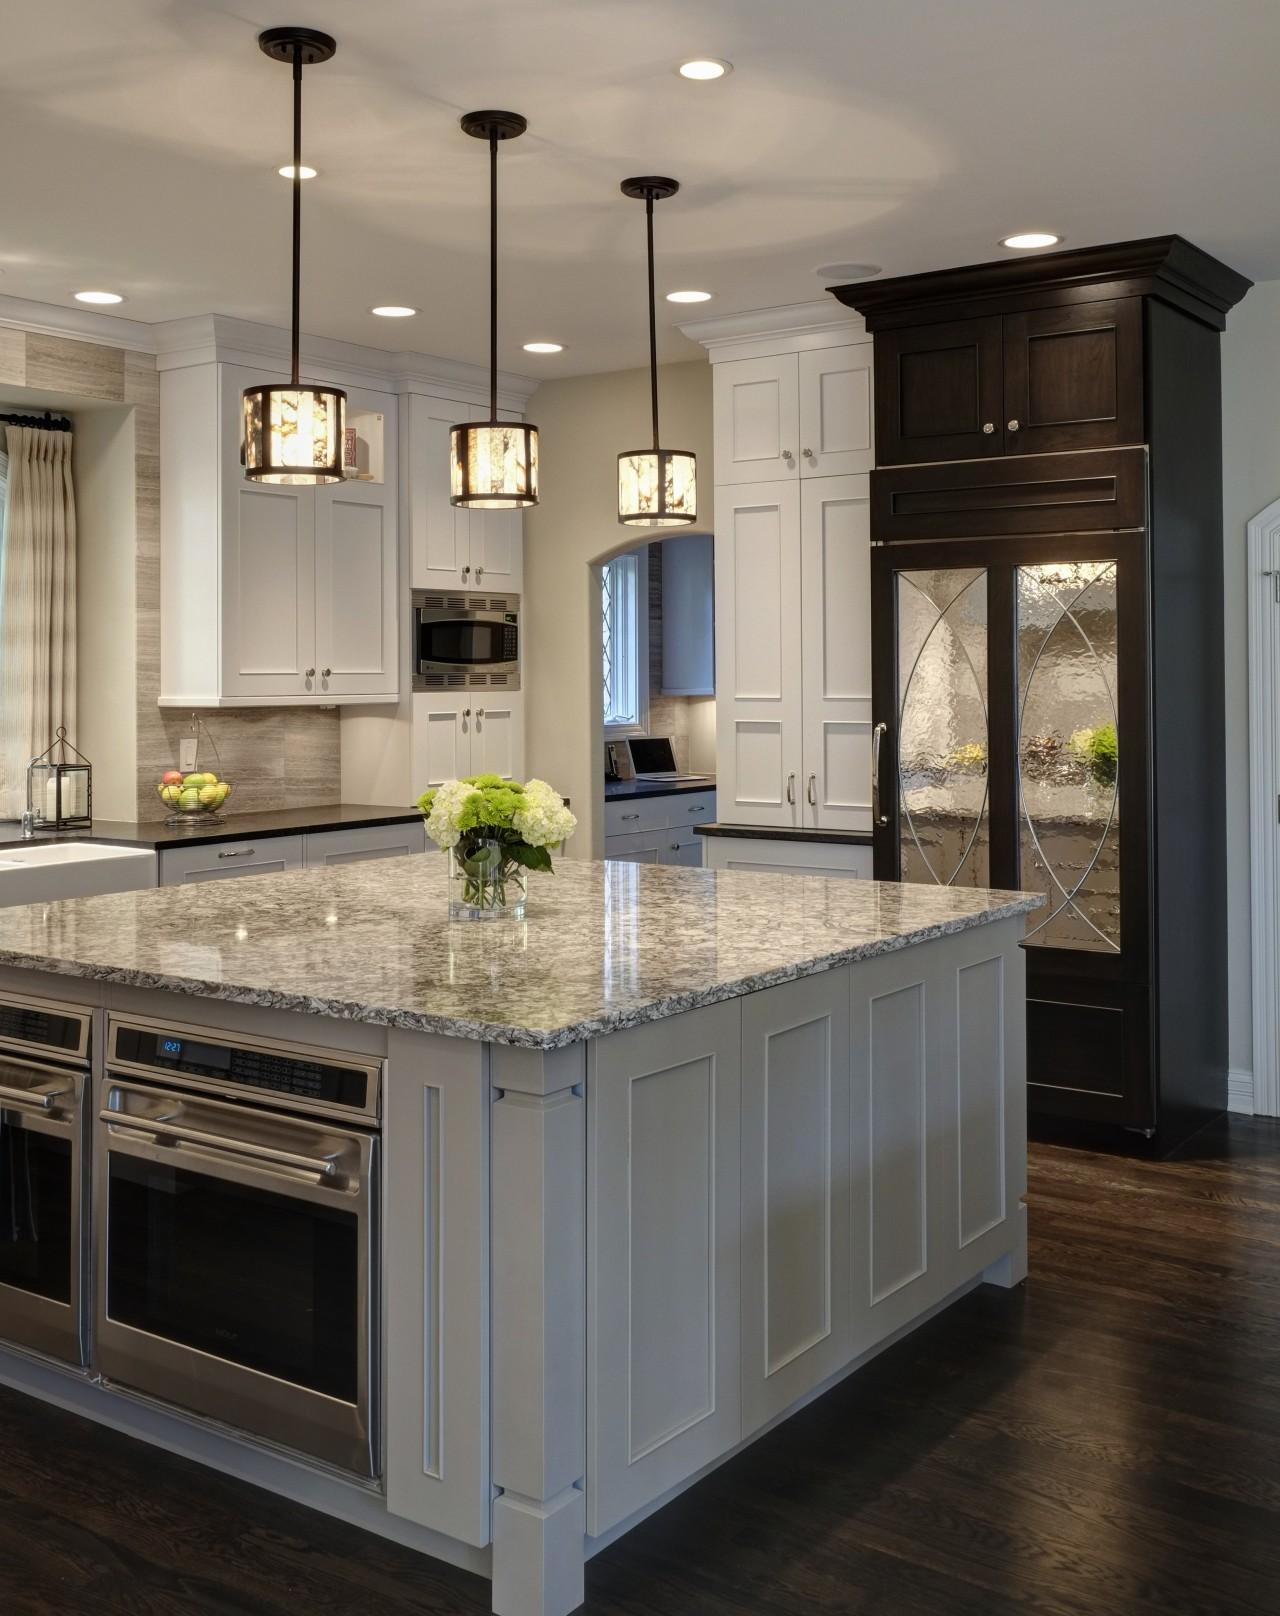 This kitchen design provides ample storage, including two cabinetry, countertop, cuisine classique, floor, flooring, hardwood, interior design, kitchen, room, wood flooring, gray, black